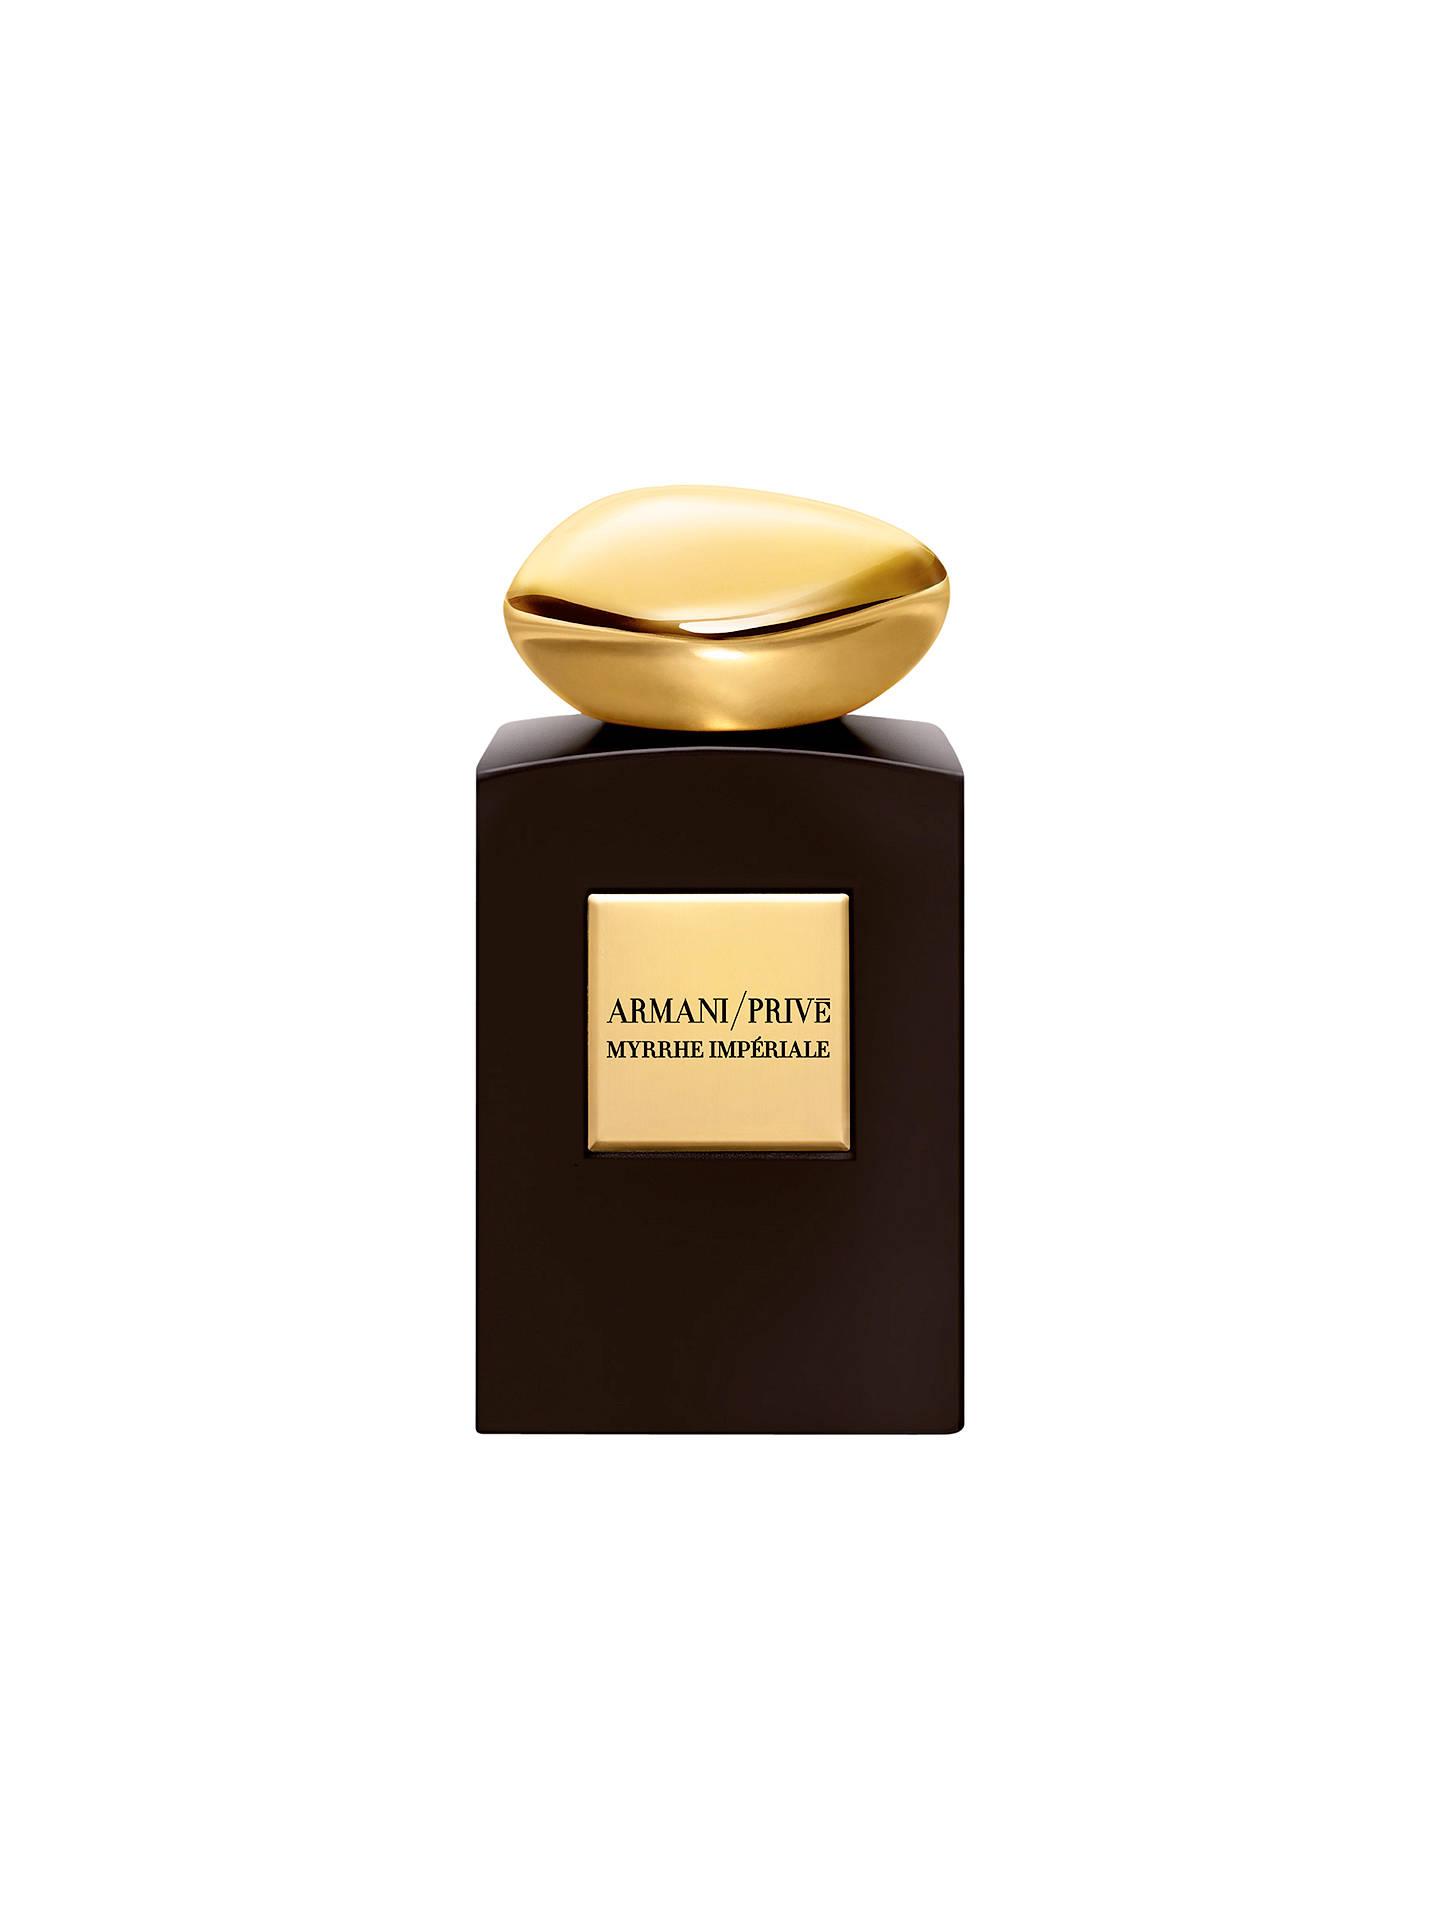 Parfum At John De Myrrhe Eau Giorgio Armani Privé Lewis Impériale 8wOPXNn0k